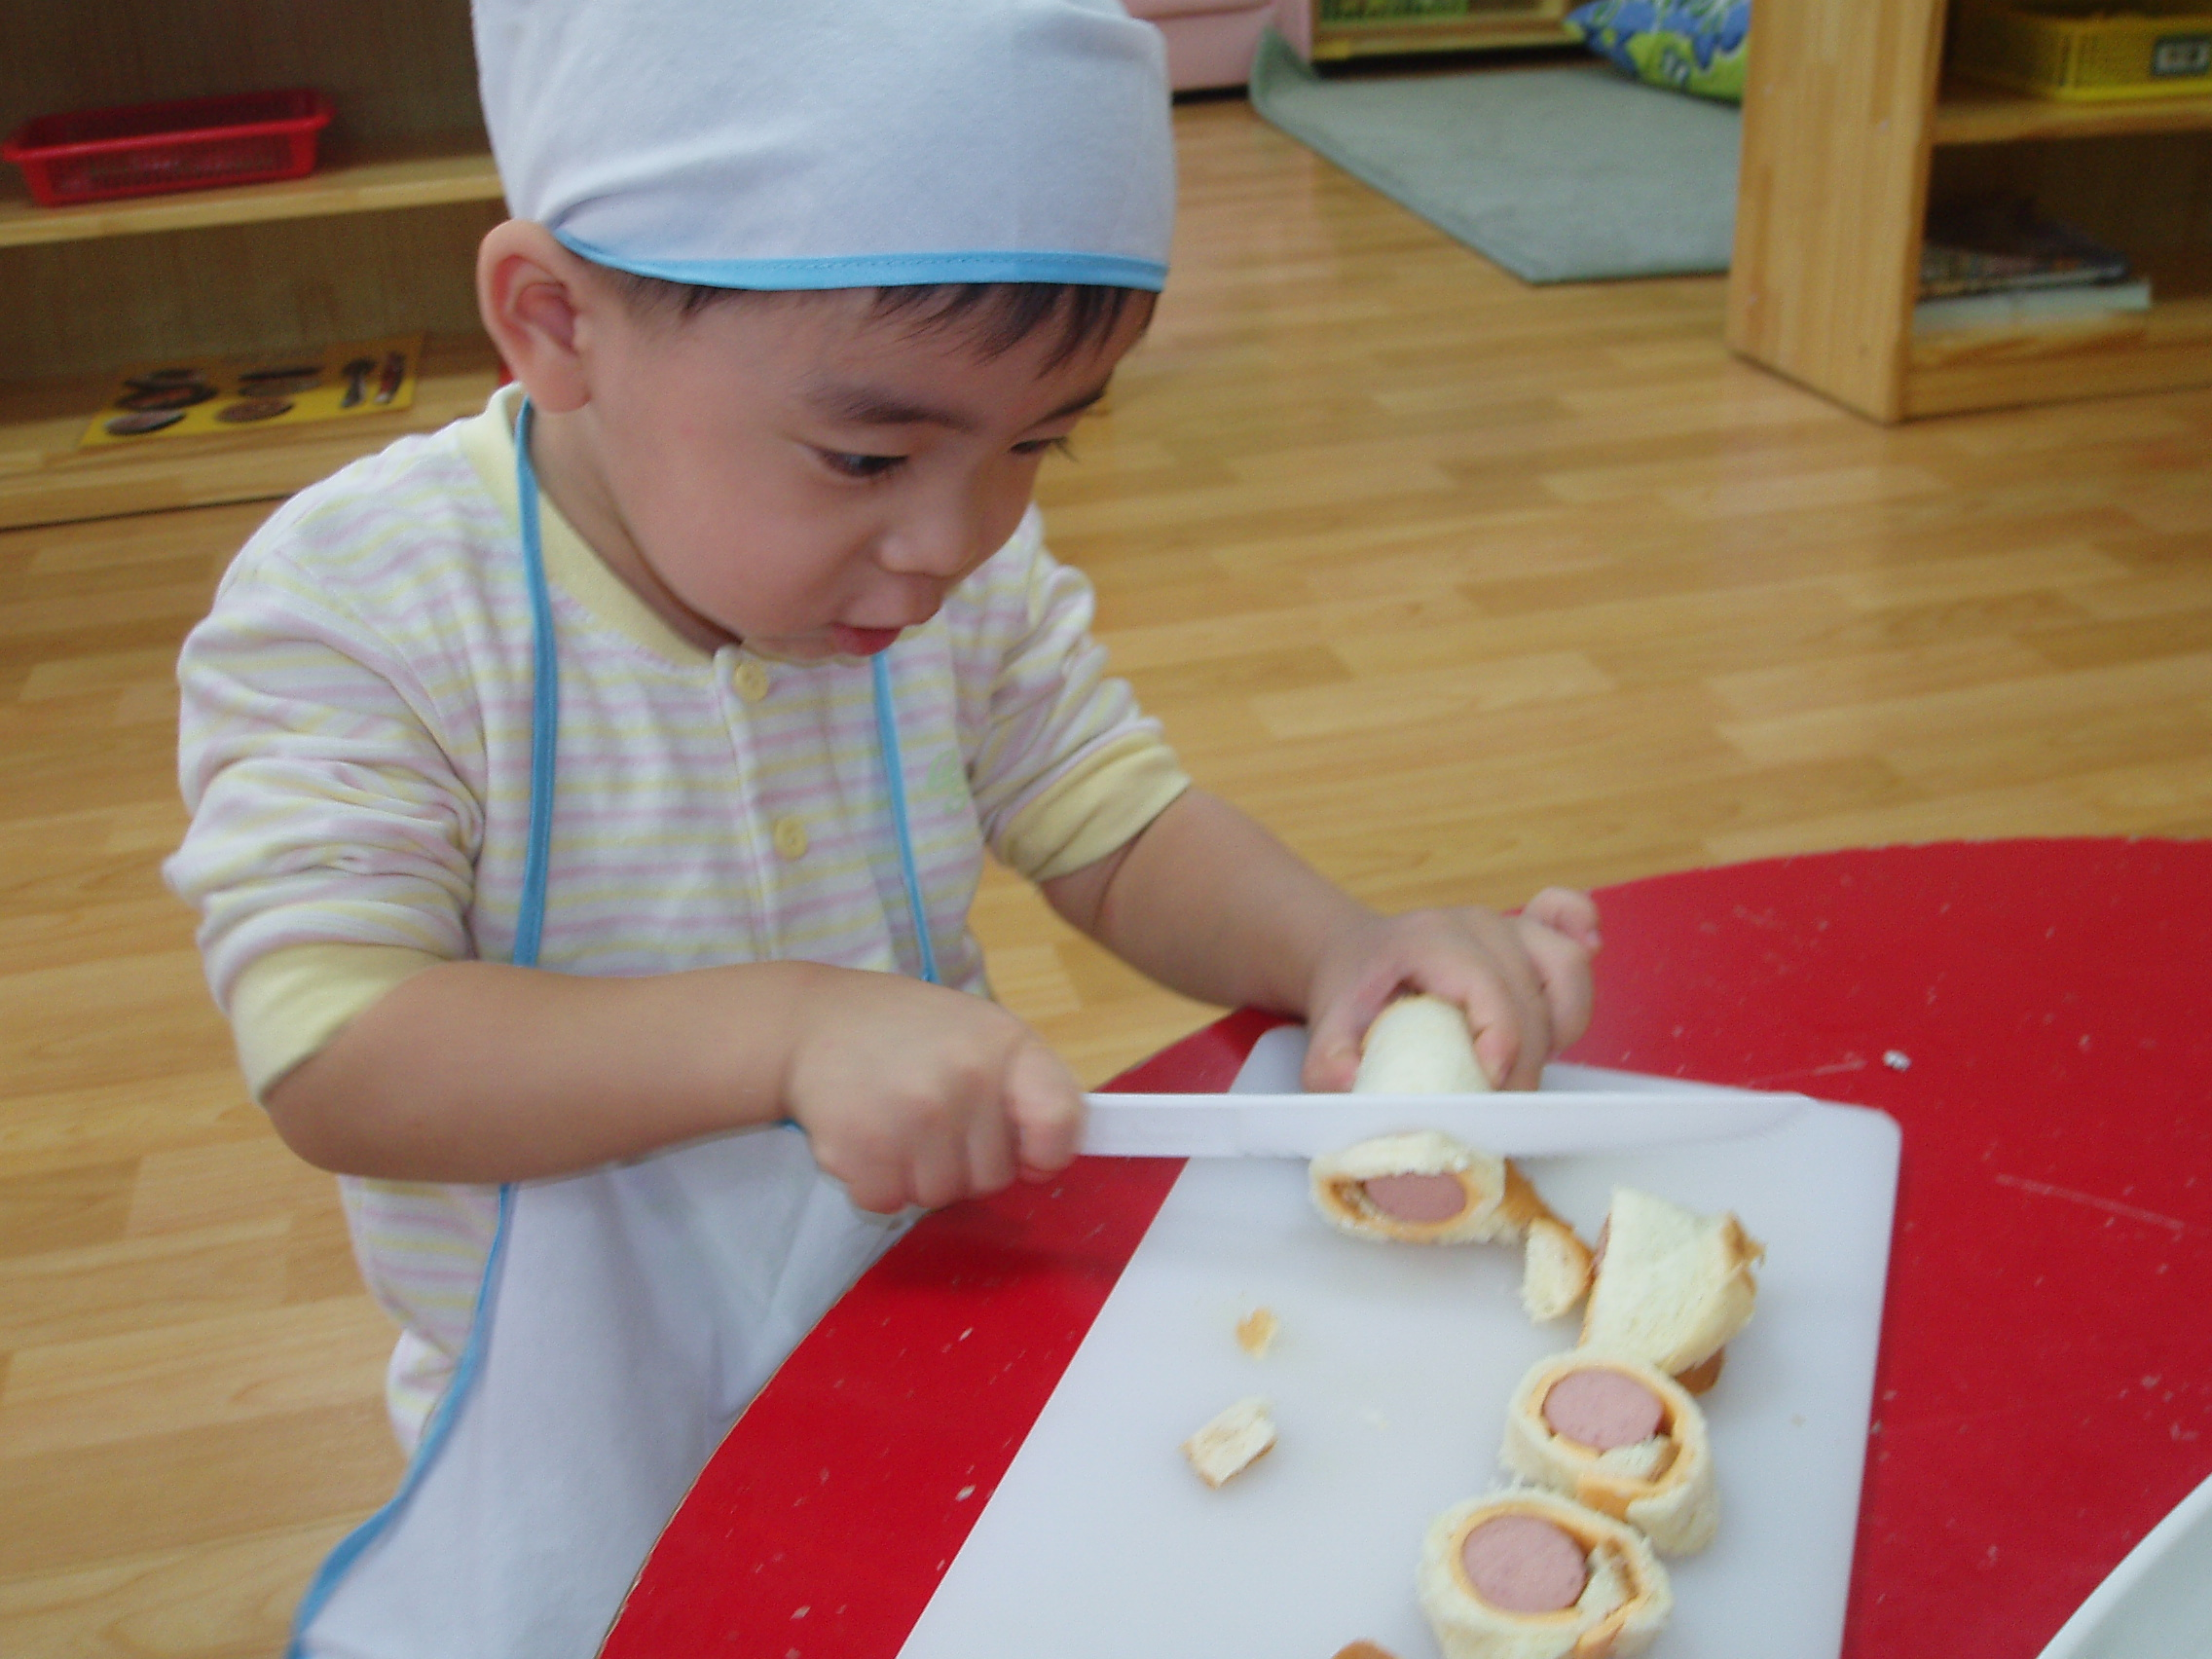 c53418075eec78 어린이집에서 한달에 한번 정도 요리만들기를 하는데